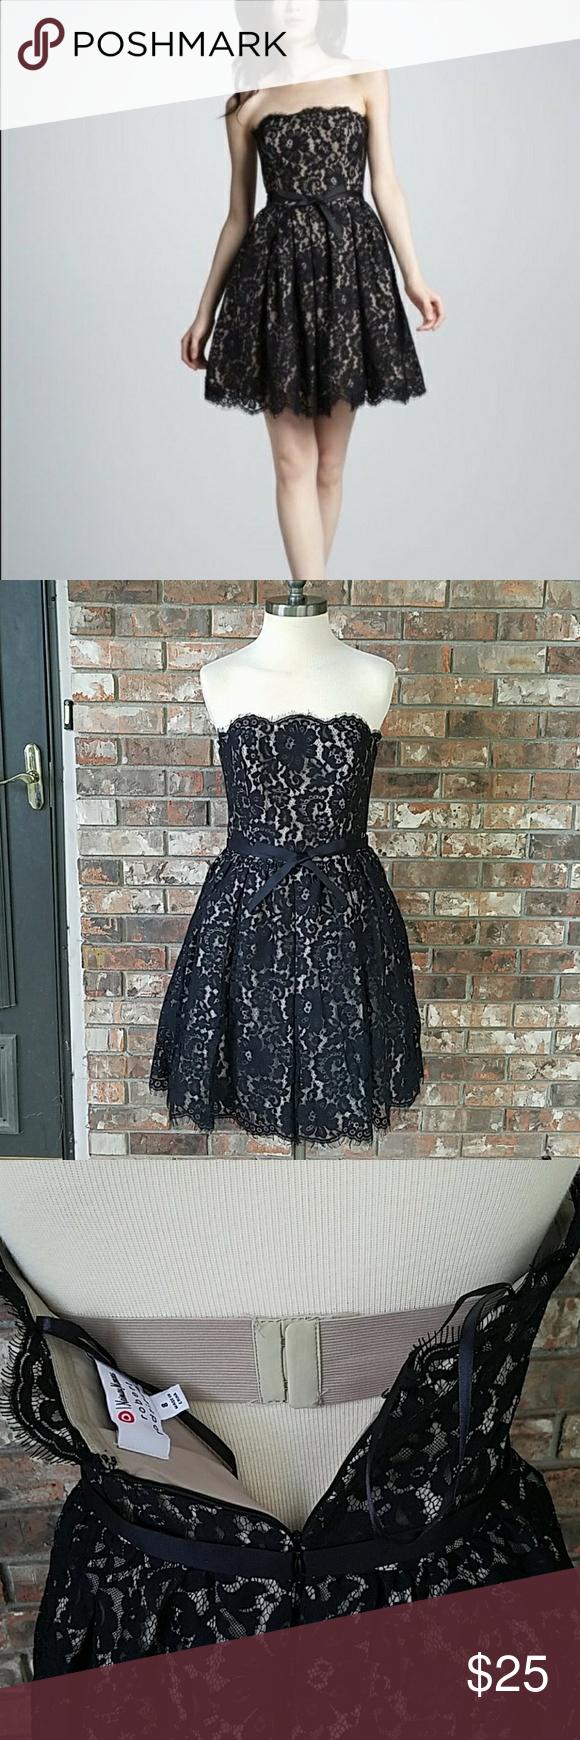 032b10cc8e Neiman Marcus Robert Rodriguez for Target Dress Black lace overlay party  dress. Strapless. Knee length. Neiman Marcus Dresses Strapless